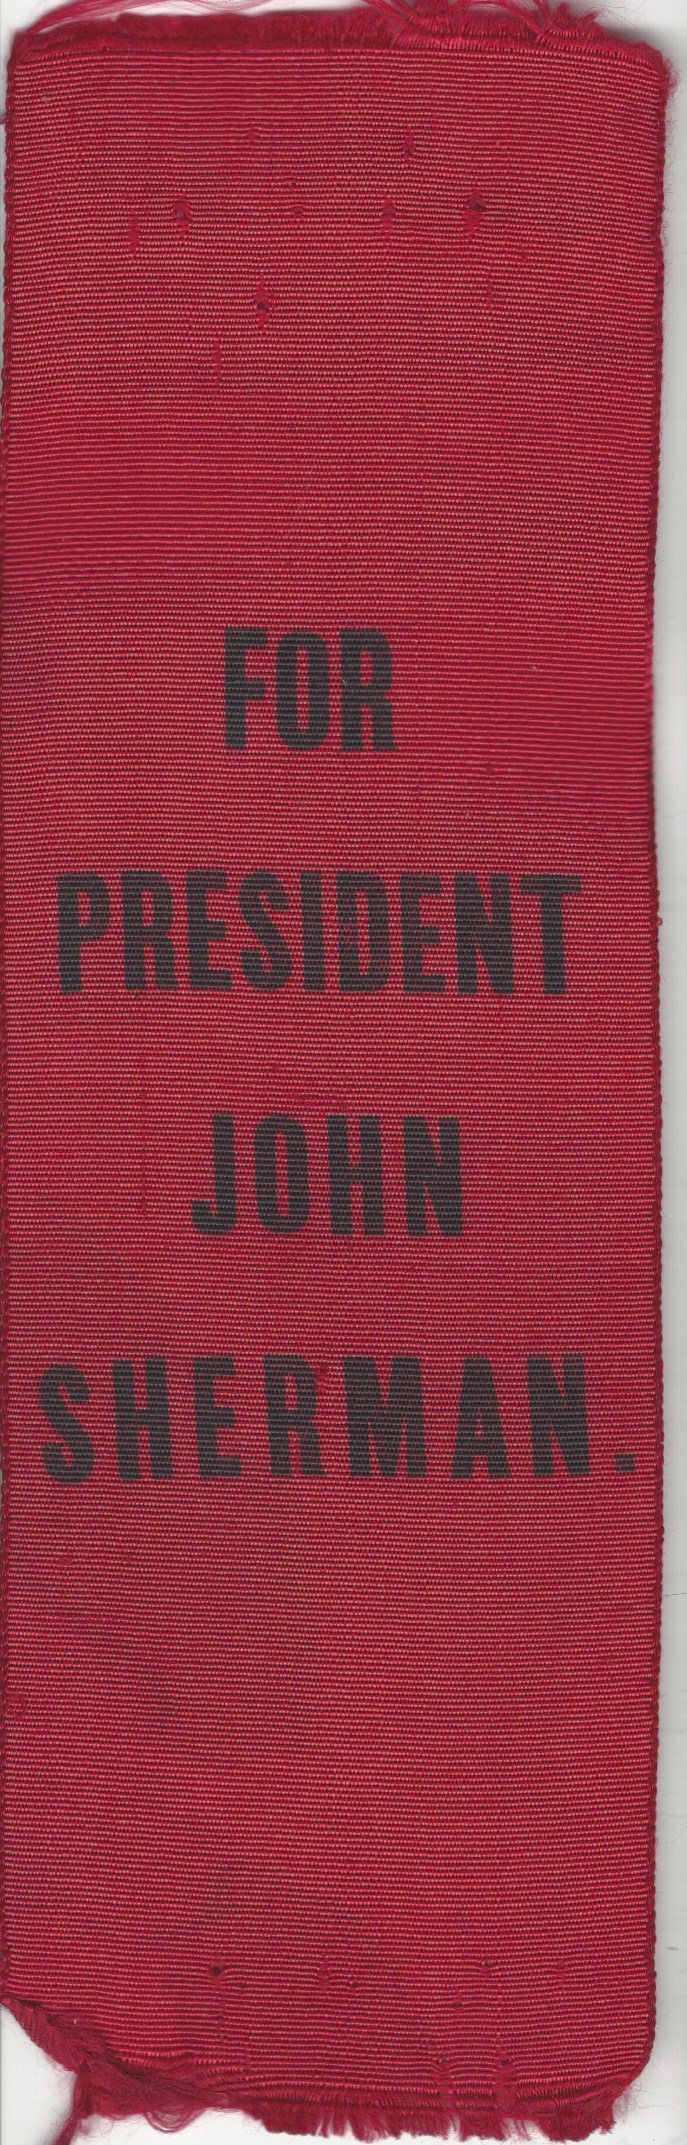 OHPres1888-01 SHERMAN.jpeg